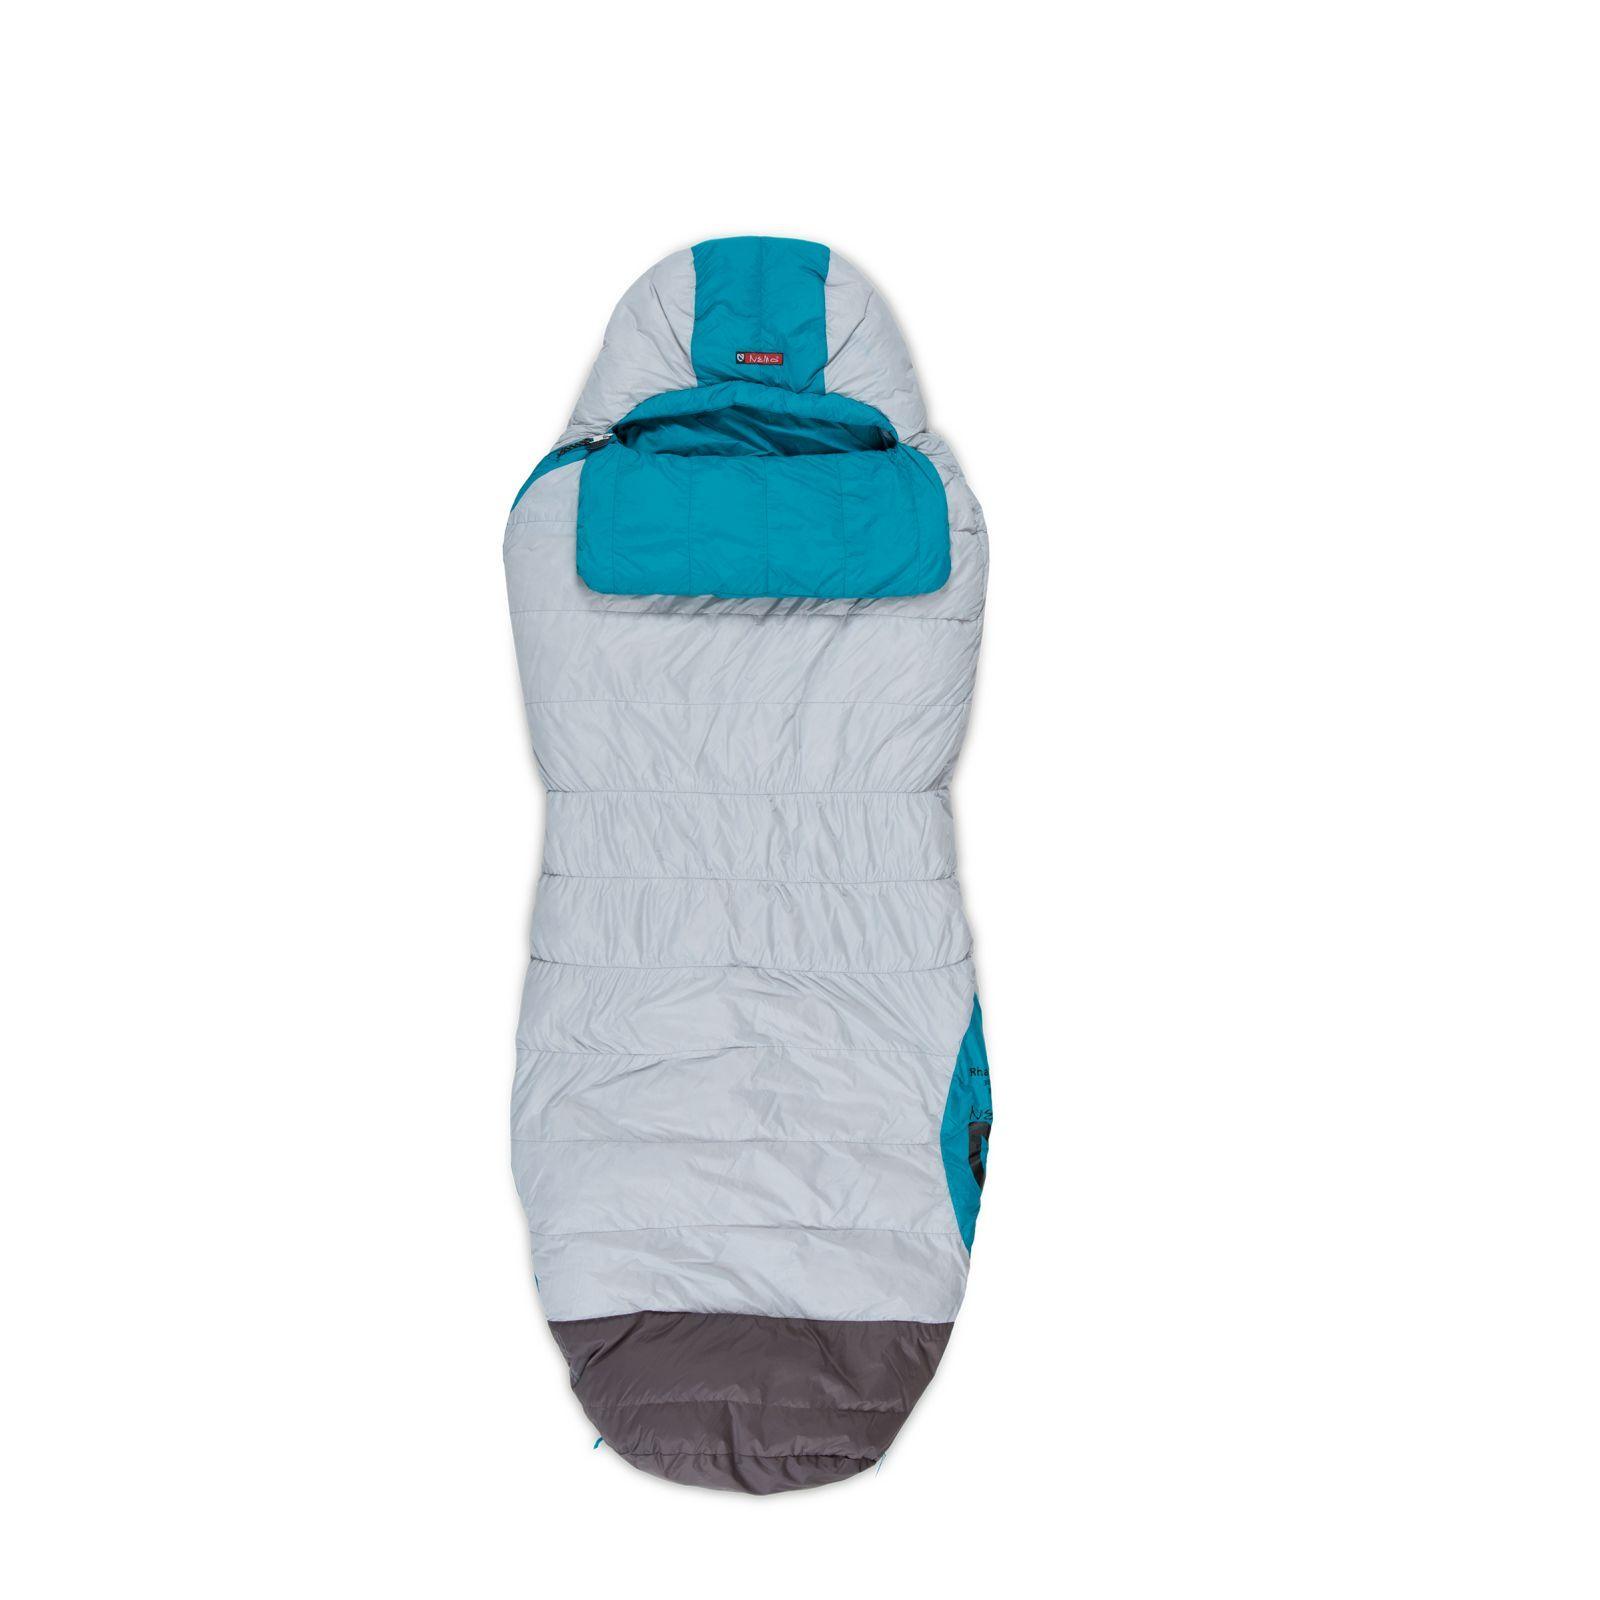 photo: NEMO Rhapsody 15 3-season down sleeping bag